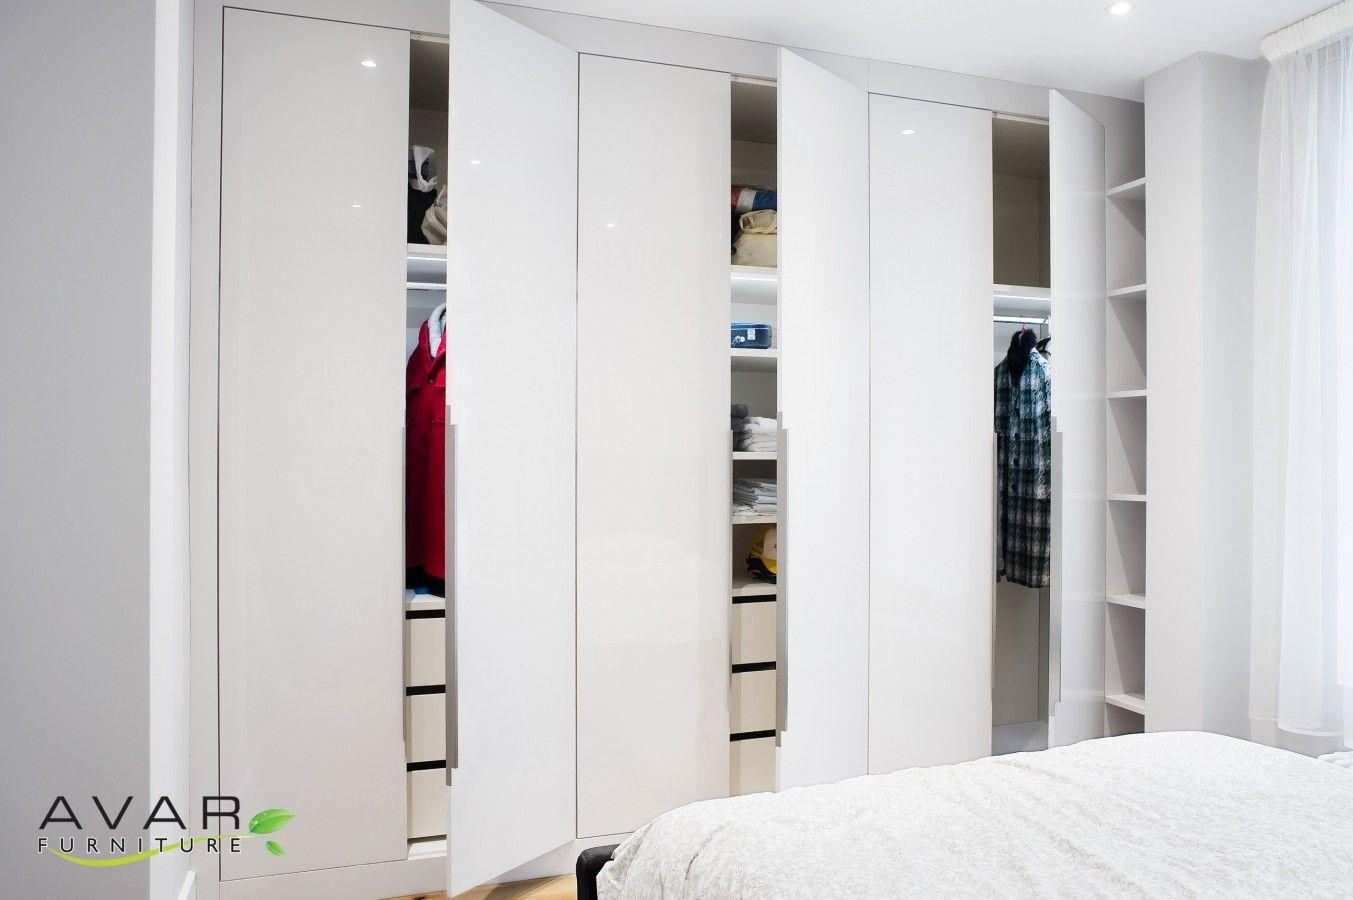 Push Open Doors From Avar Furniture